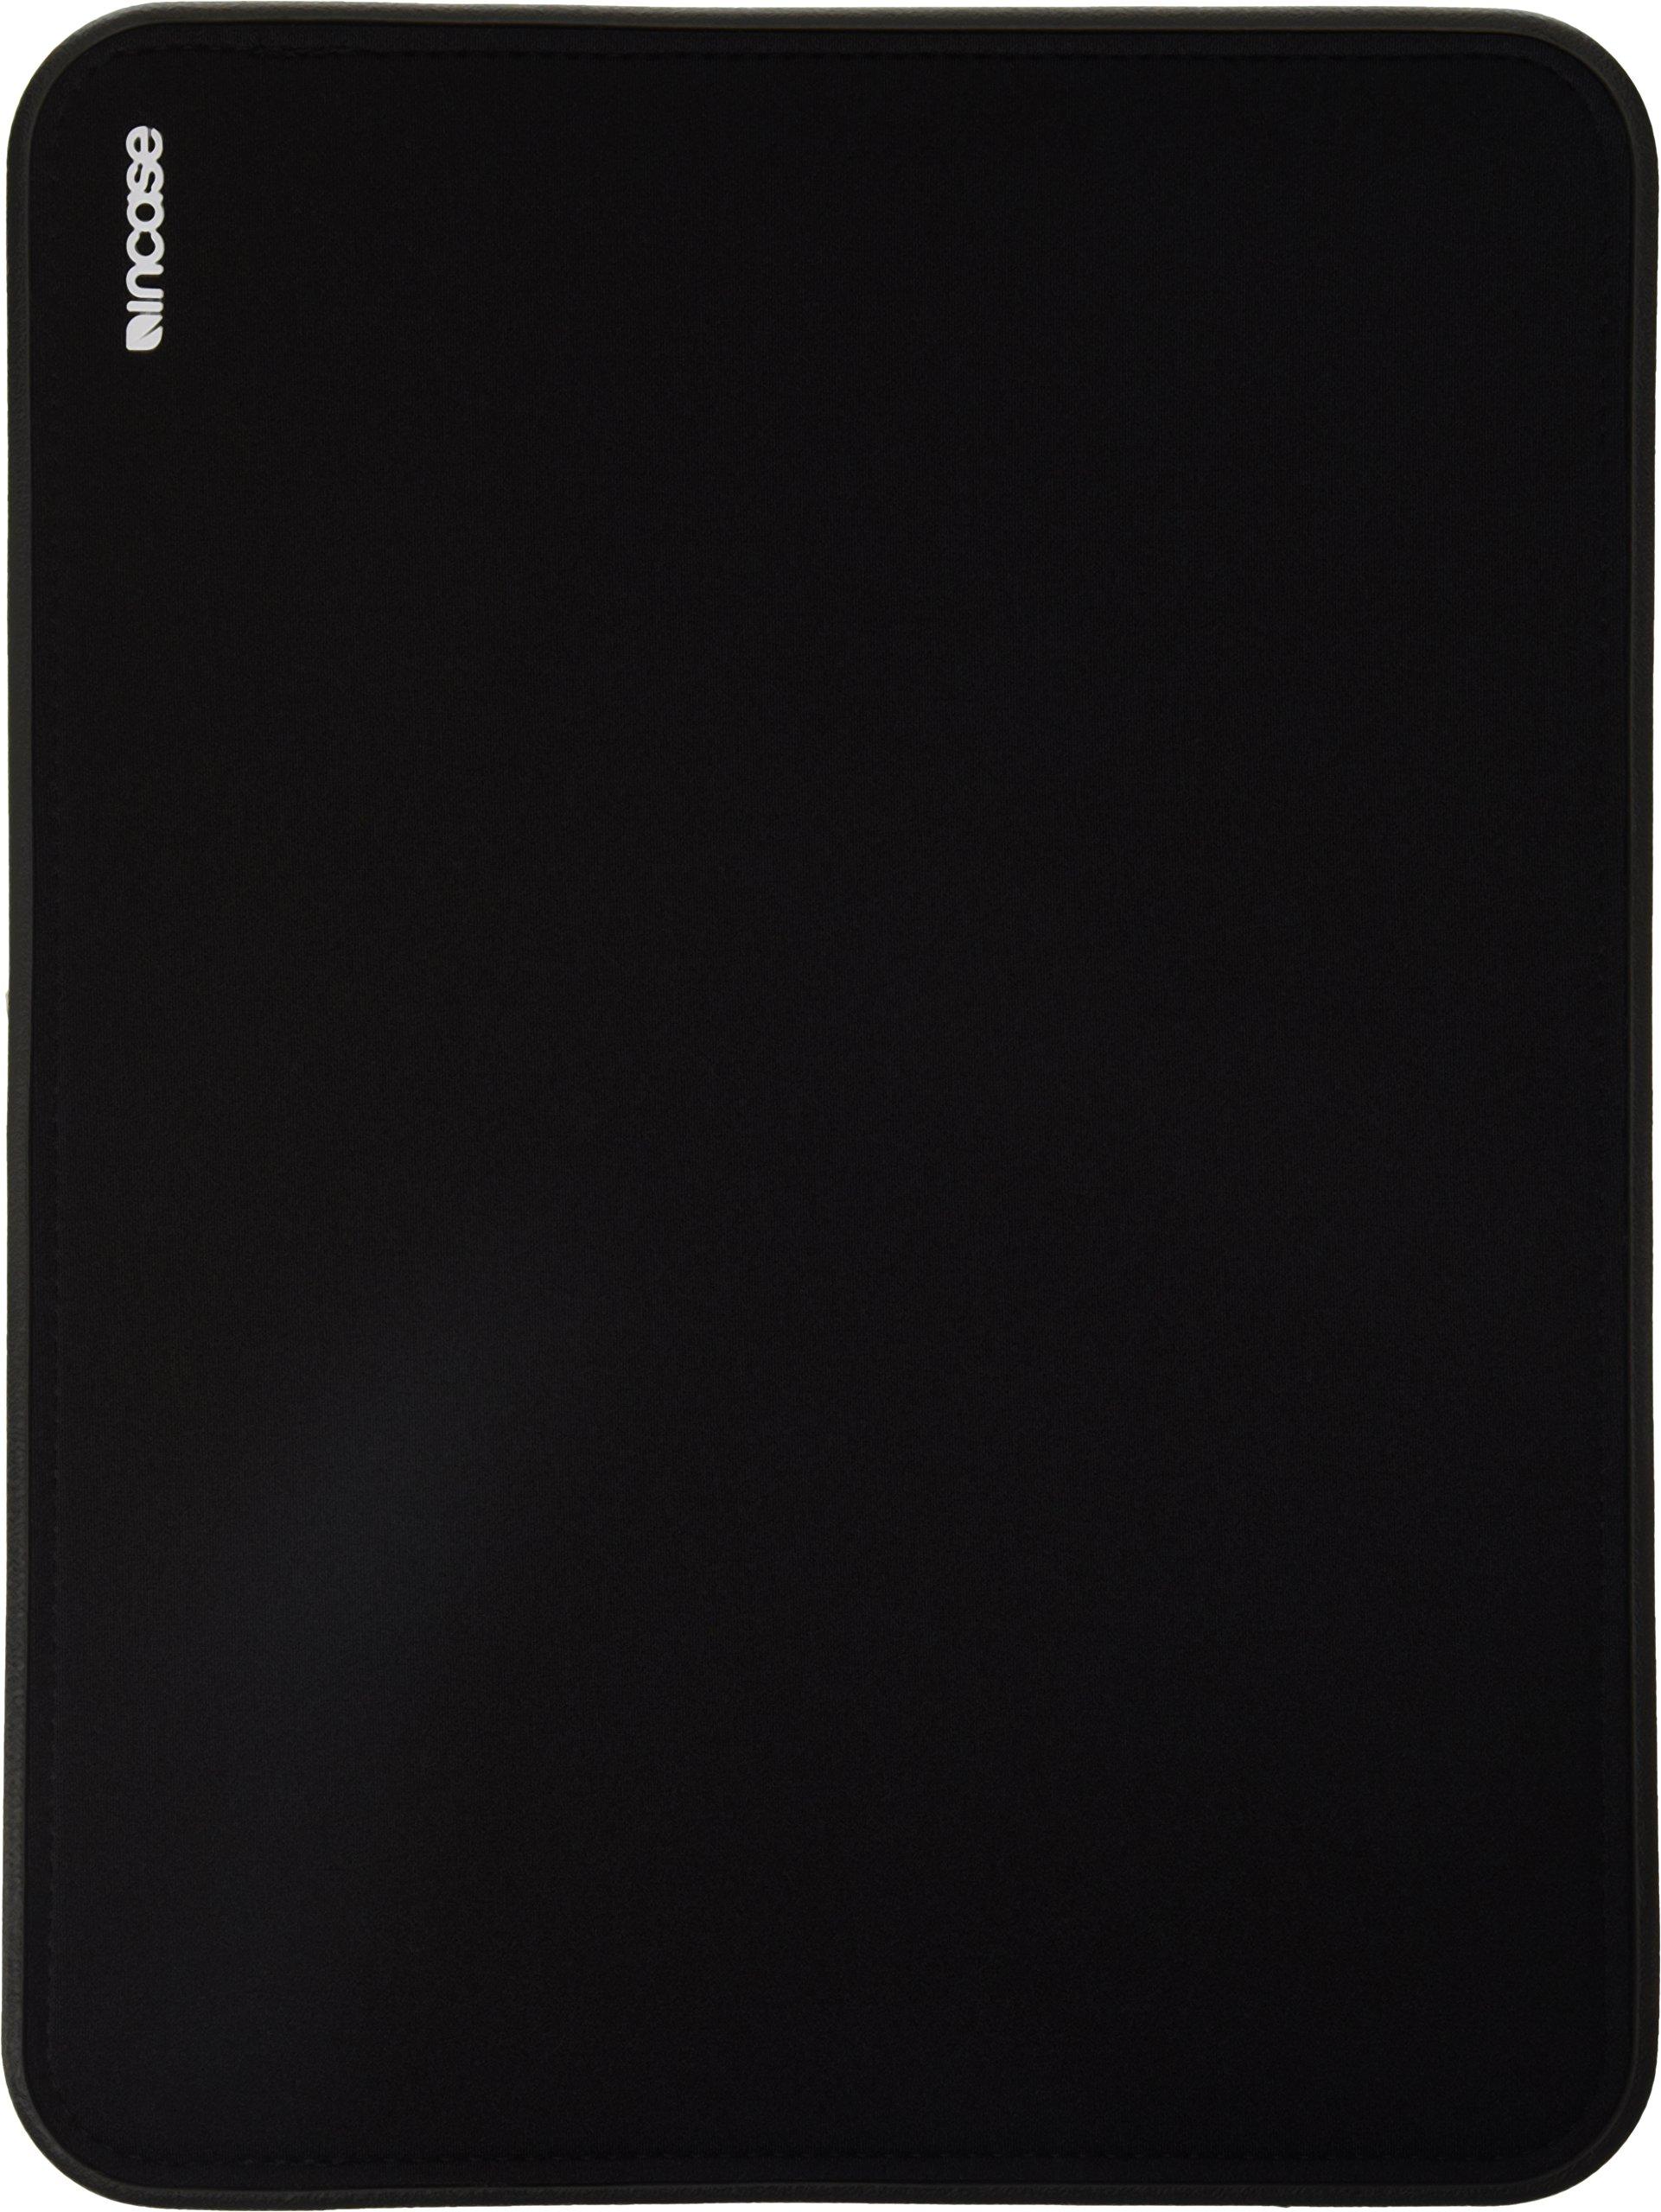 Incase ICON Sleeve with TENSAERLITE for 13'' MacBook Air - Black/Slate - CL60656